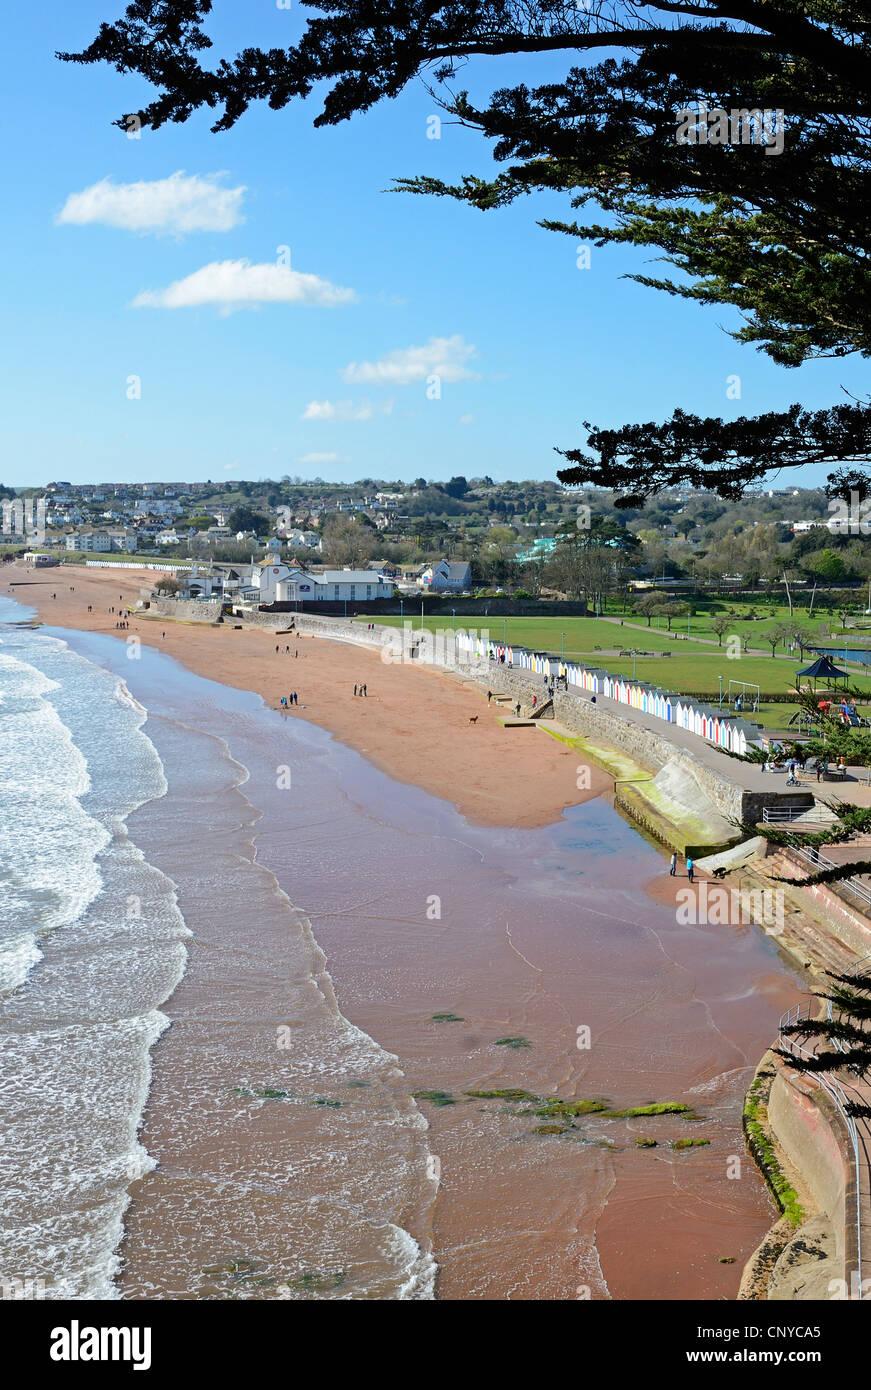 The beach at Goodrington sands near Paignton in Devon, UK - Stock Image